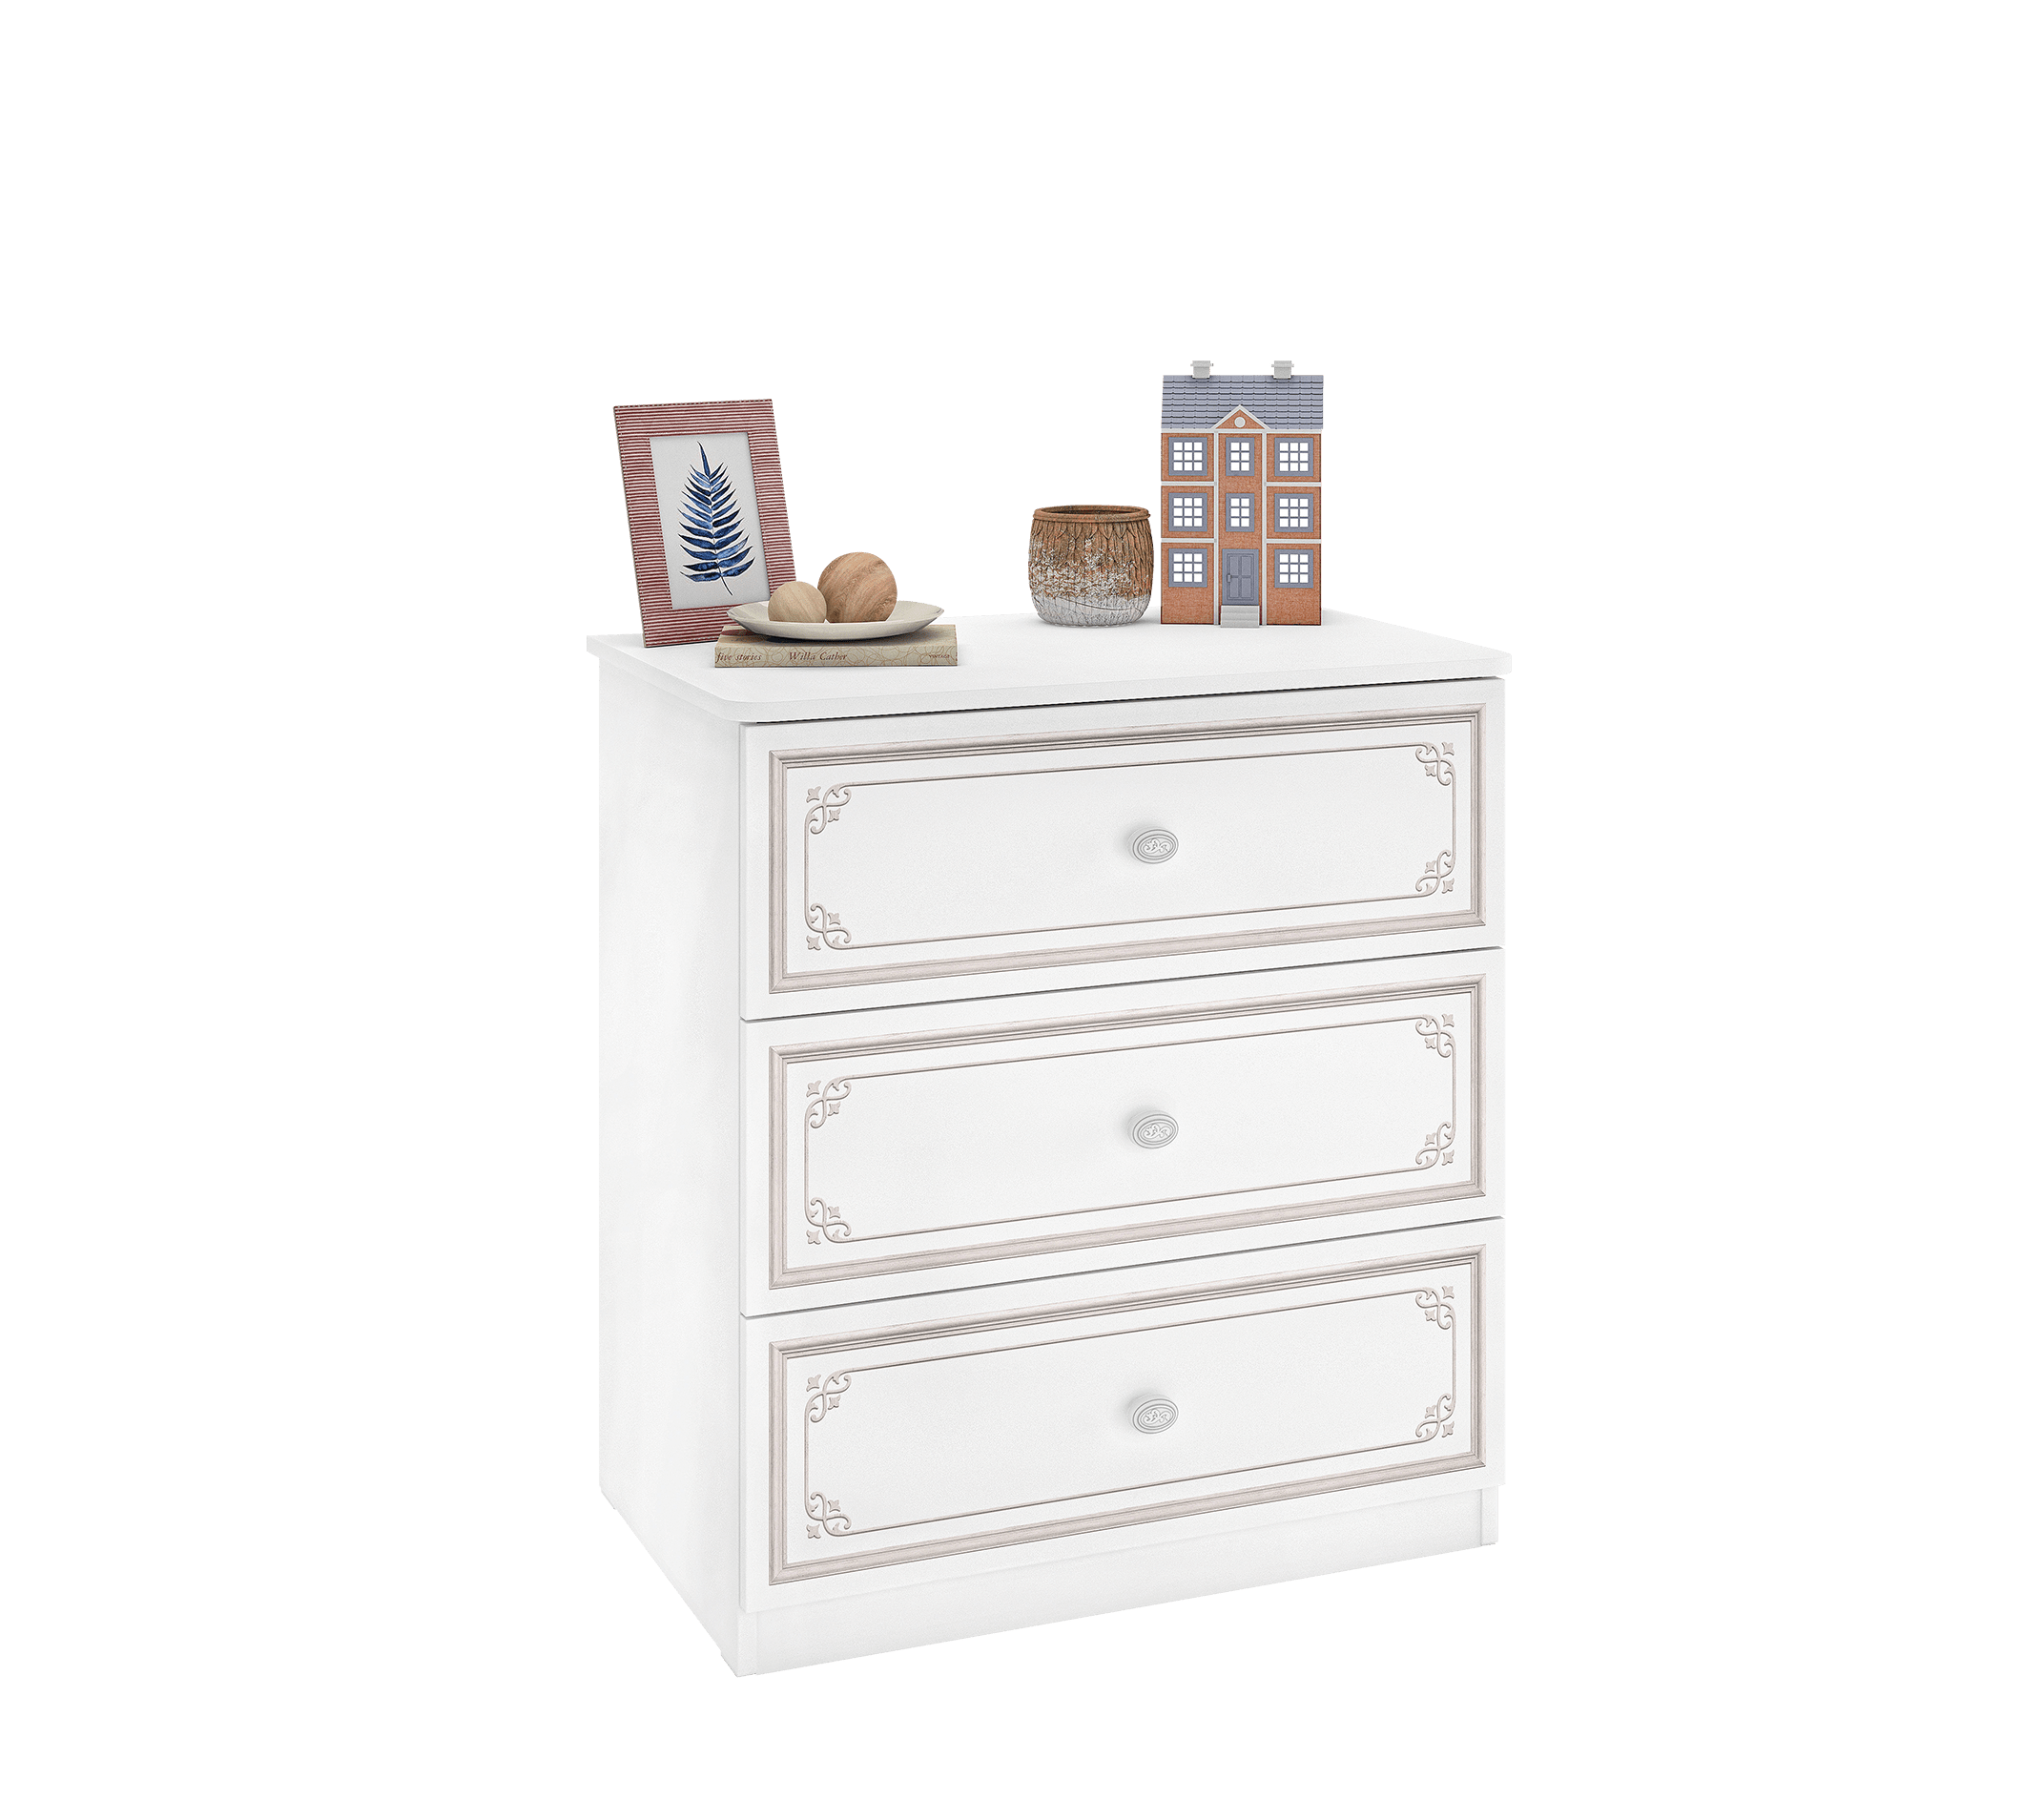 Comoda din pal cu 3 sertare, pentru tineret Selena Small Grey Alb / Gri, l73xA49xH80 cm imagine